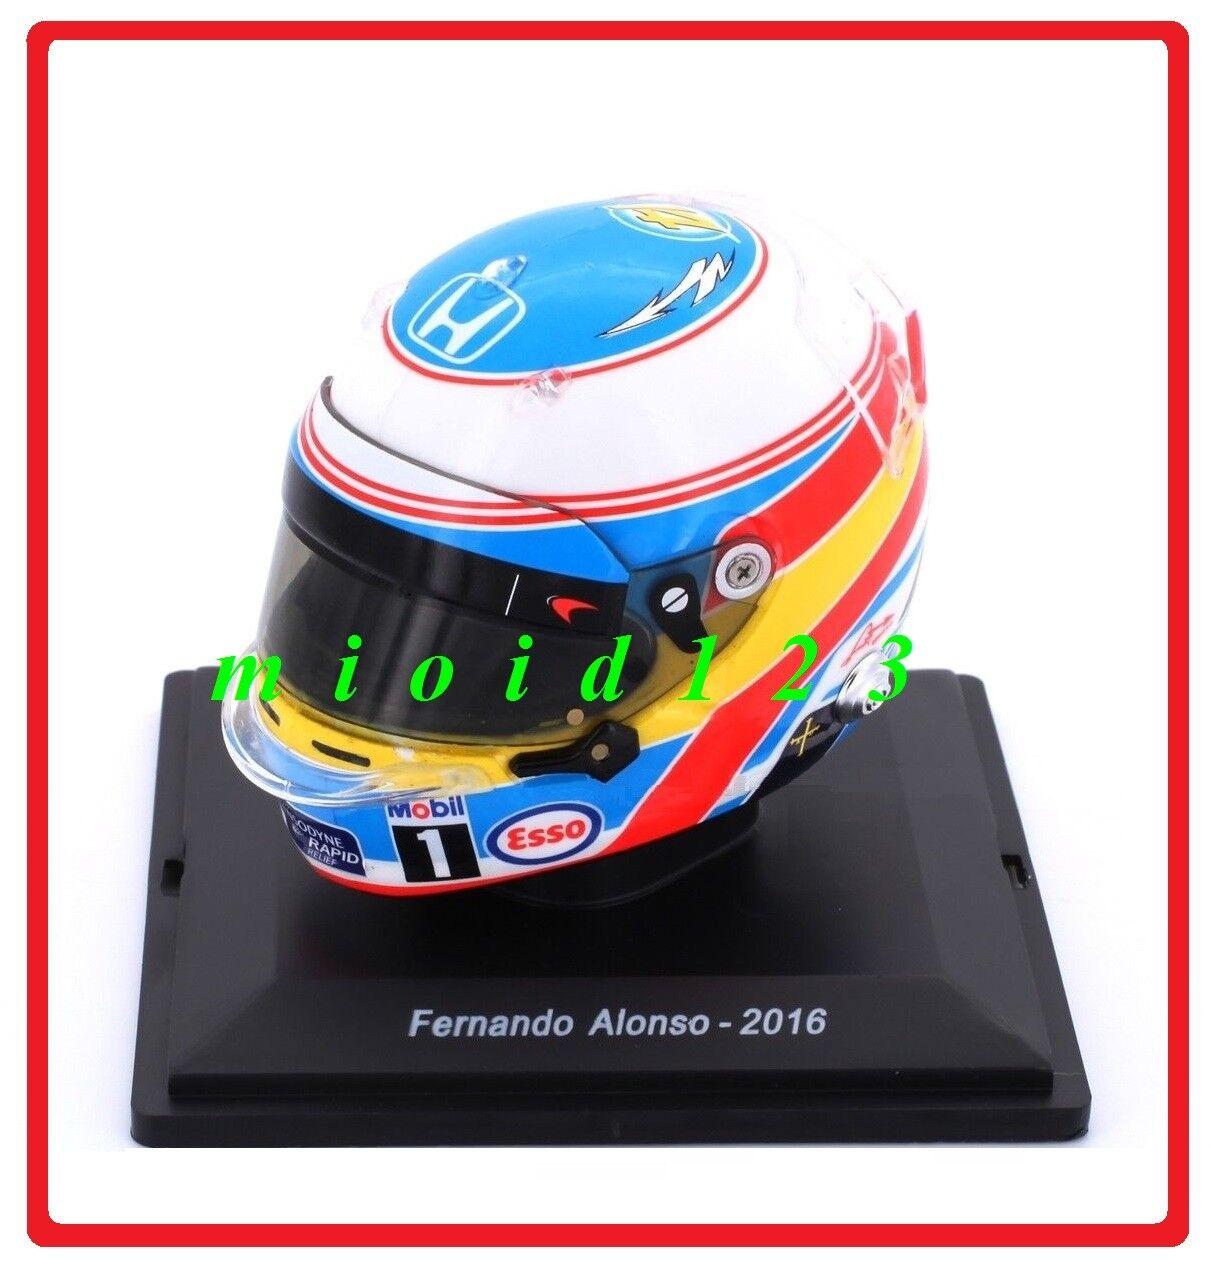 2017-Fernando Alonso  arai gp6 - 1 5 - [HELMET-Helmet]